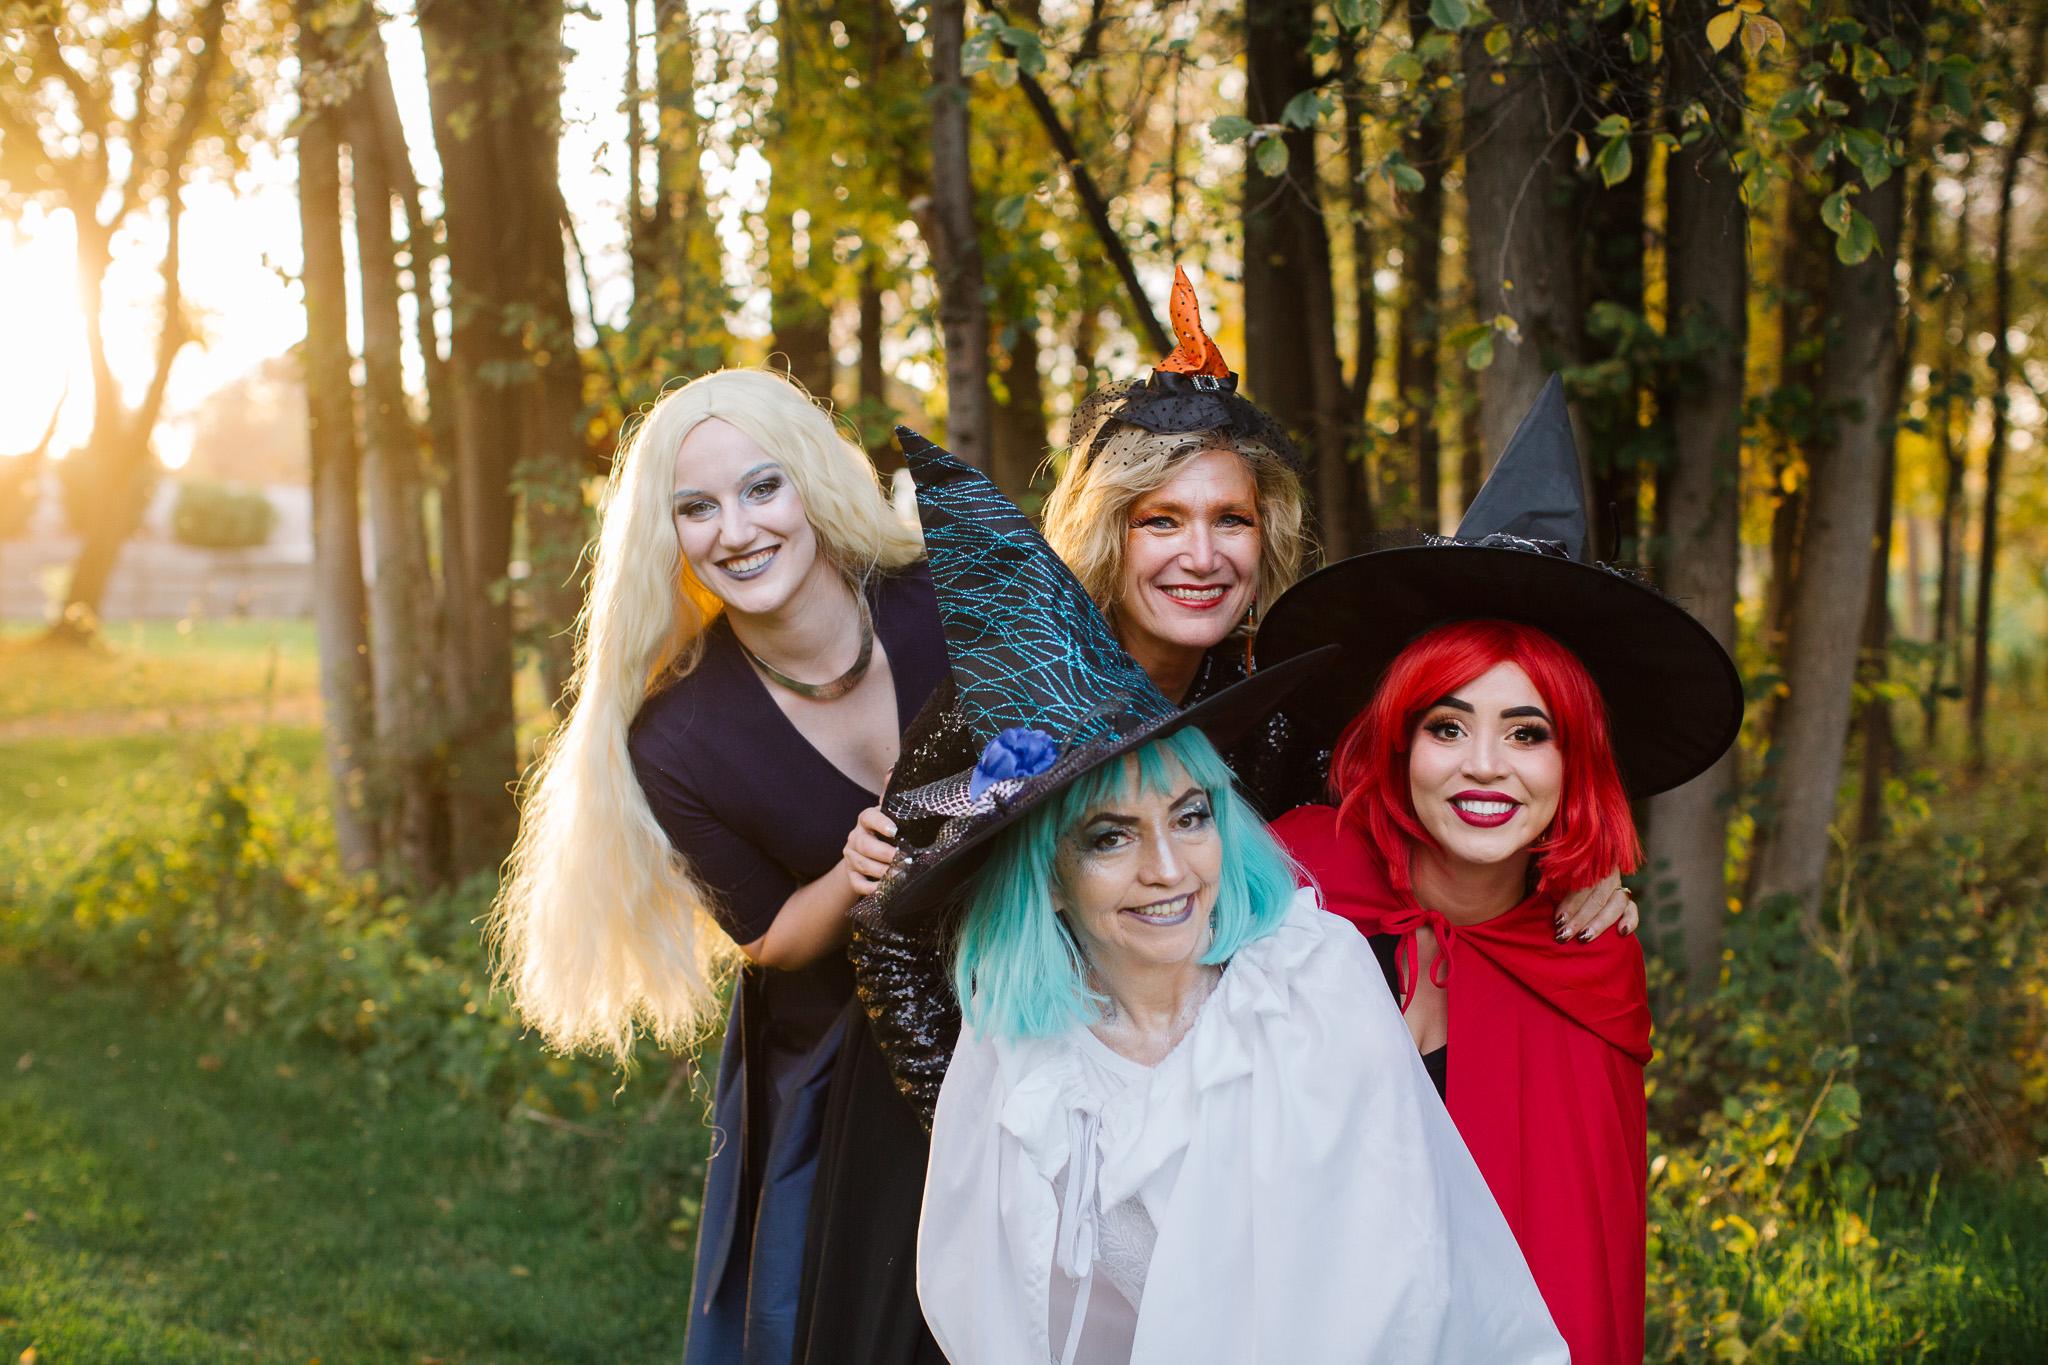 WitchesFire&Ice_JTP2018_021.jpg